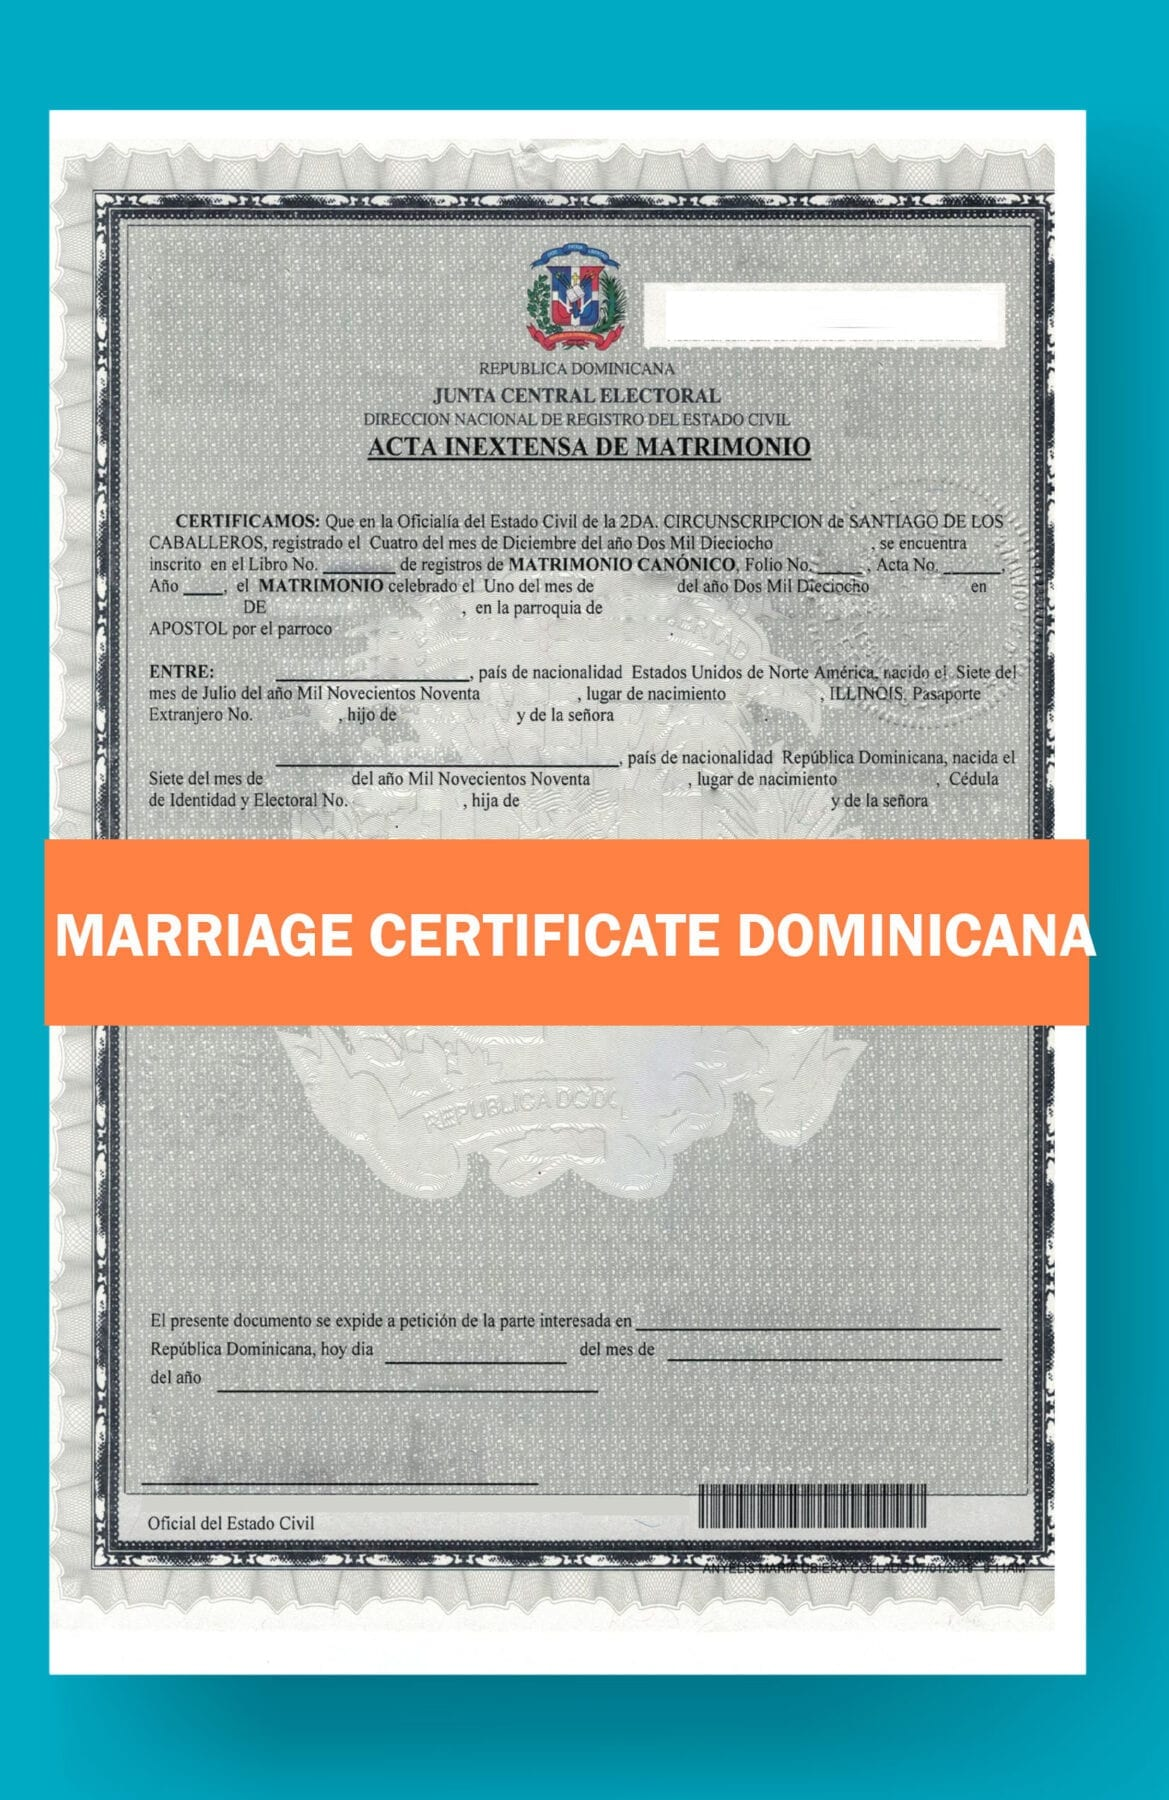 MARRIAGE-CERTIFICATE-TEMPLATE-DOMINICANA